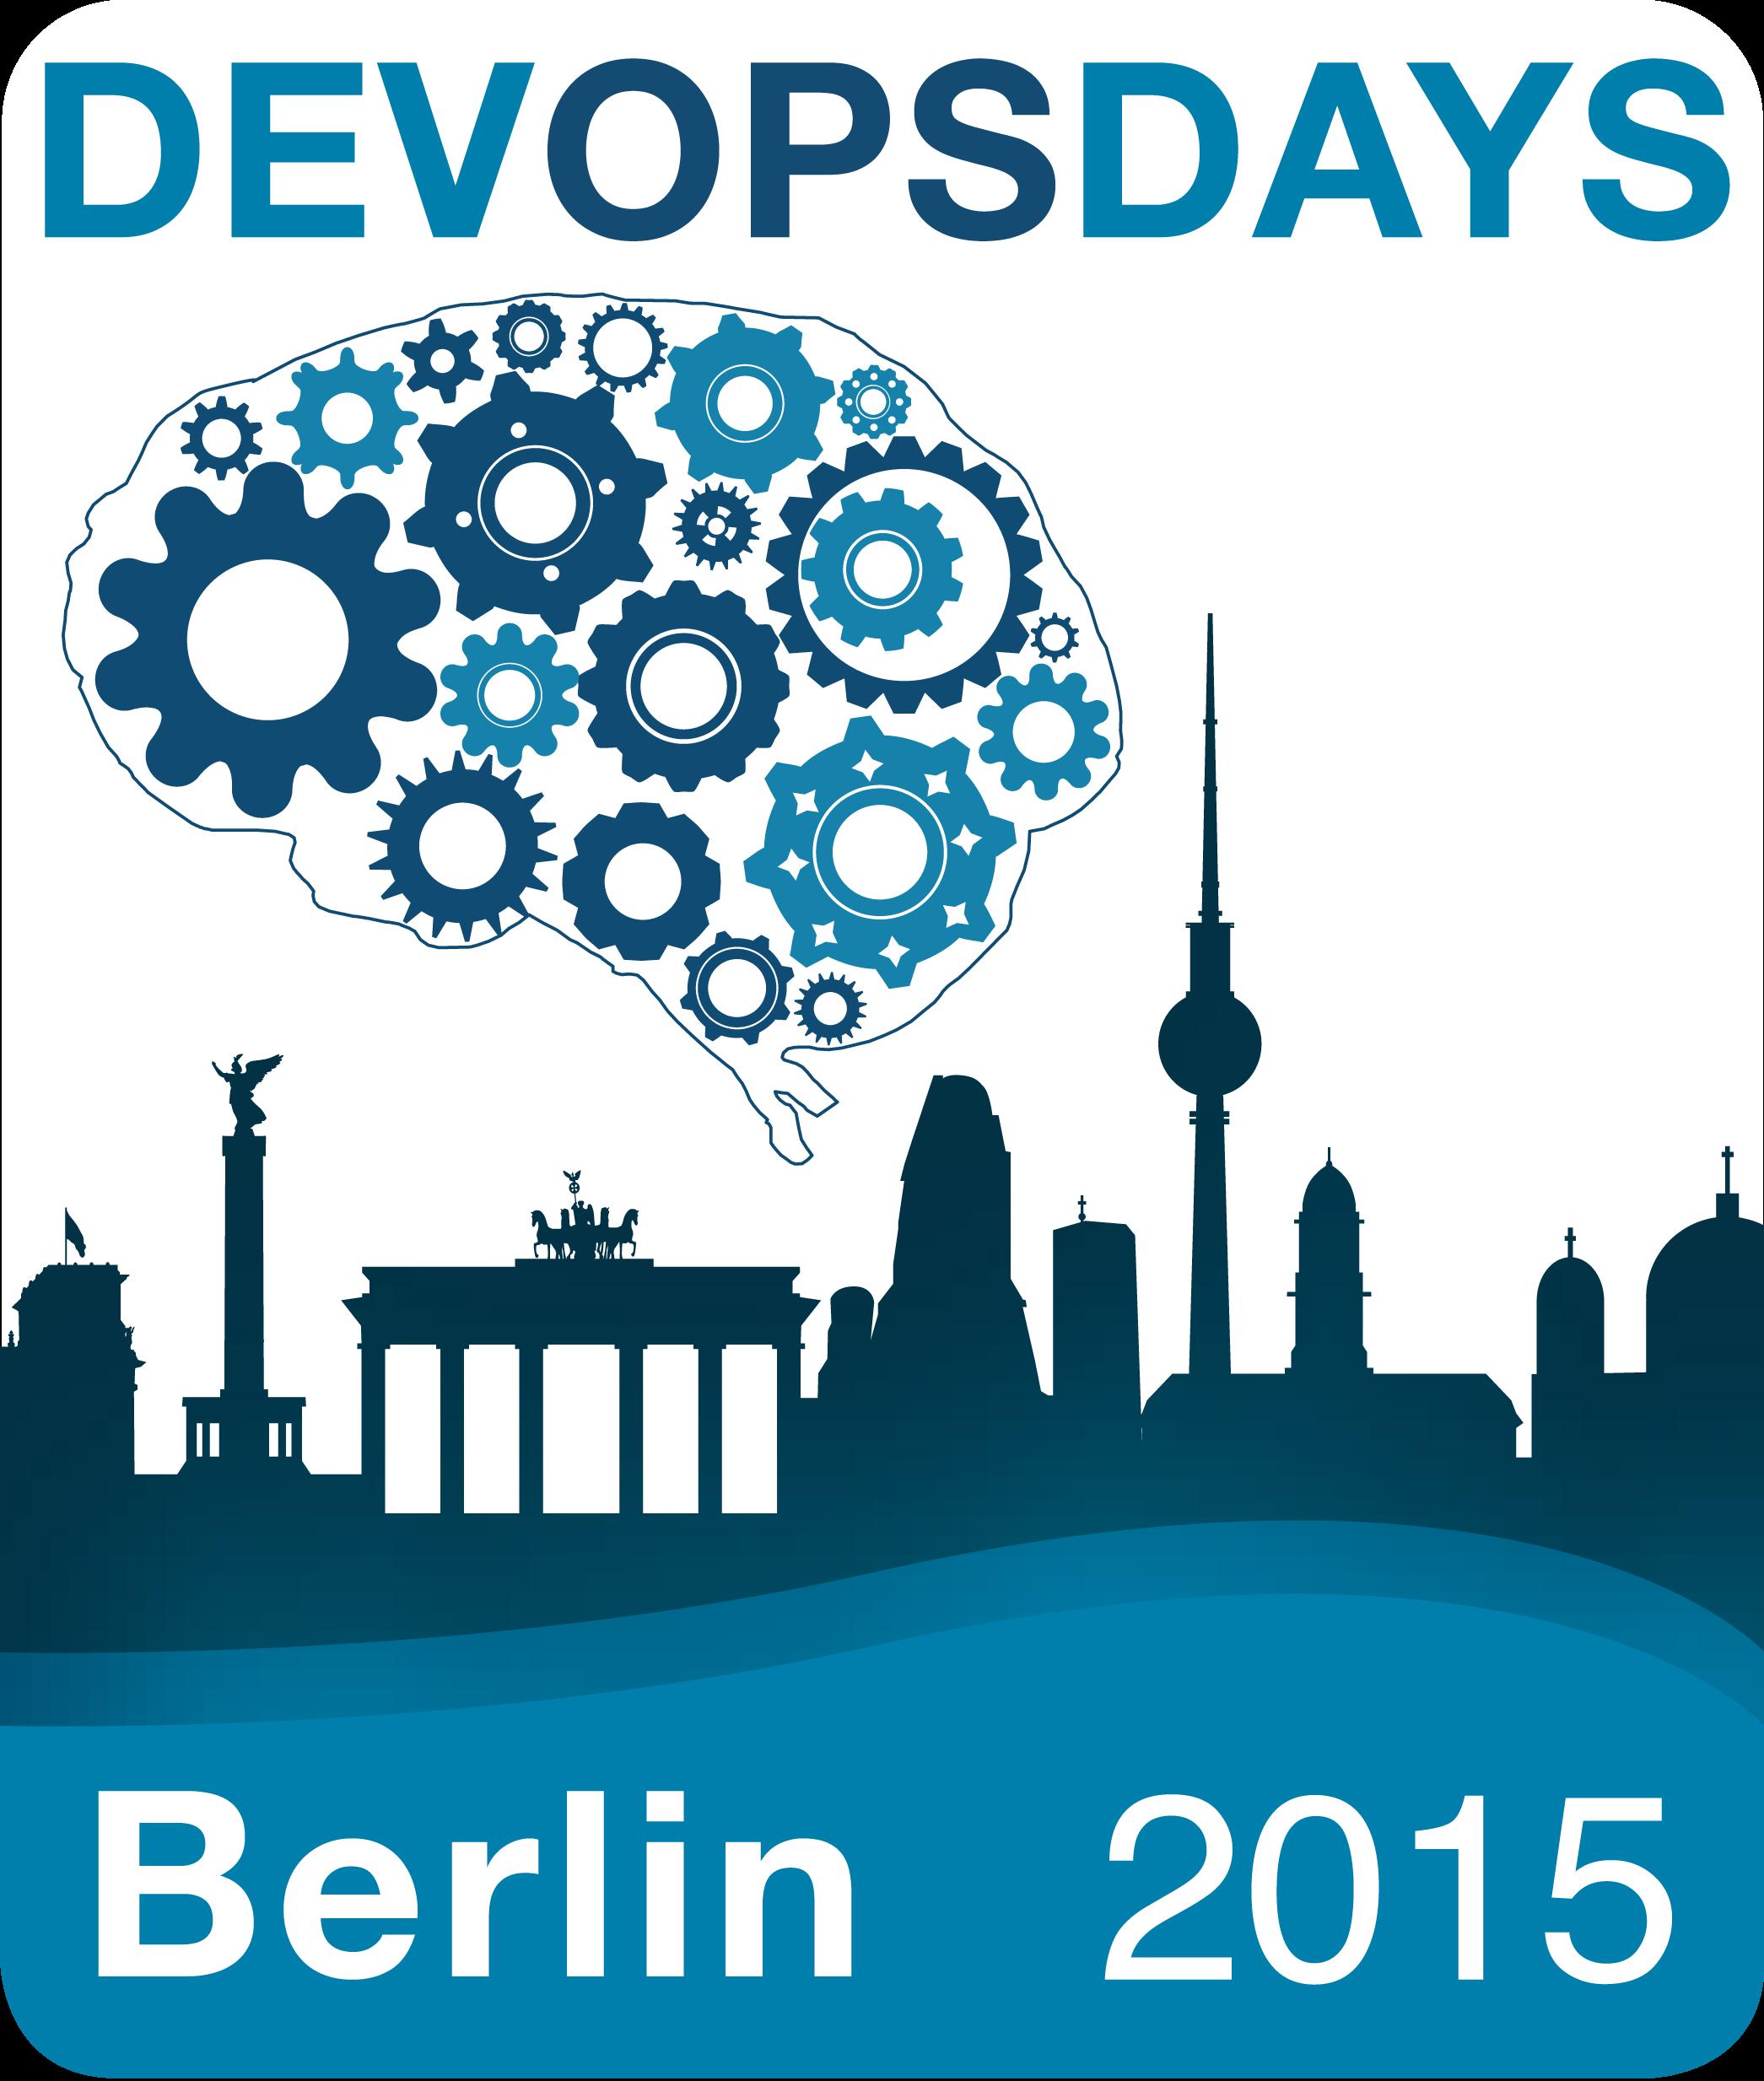 DevOpsDays Berlin 2015 logo